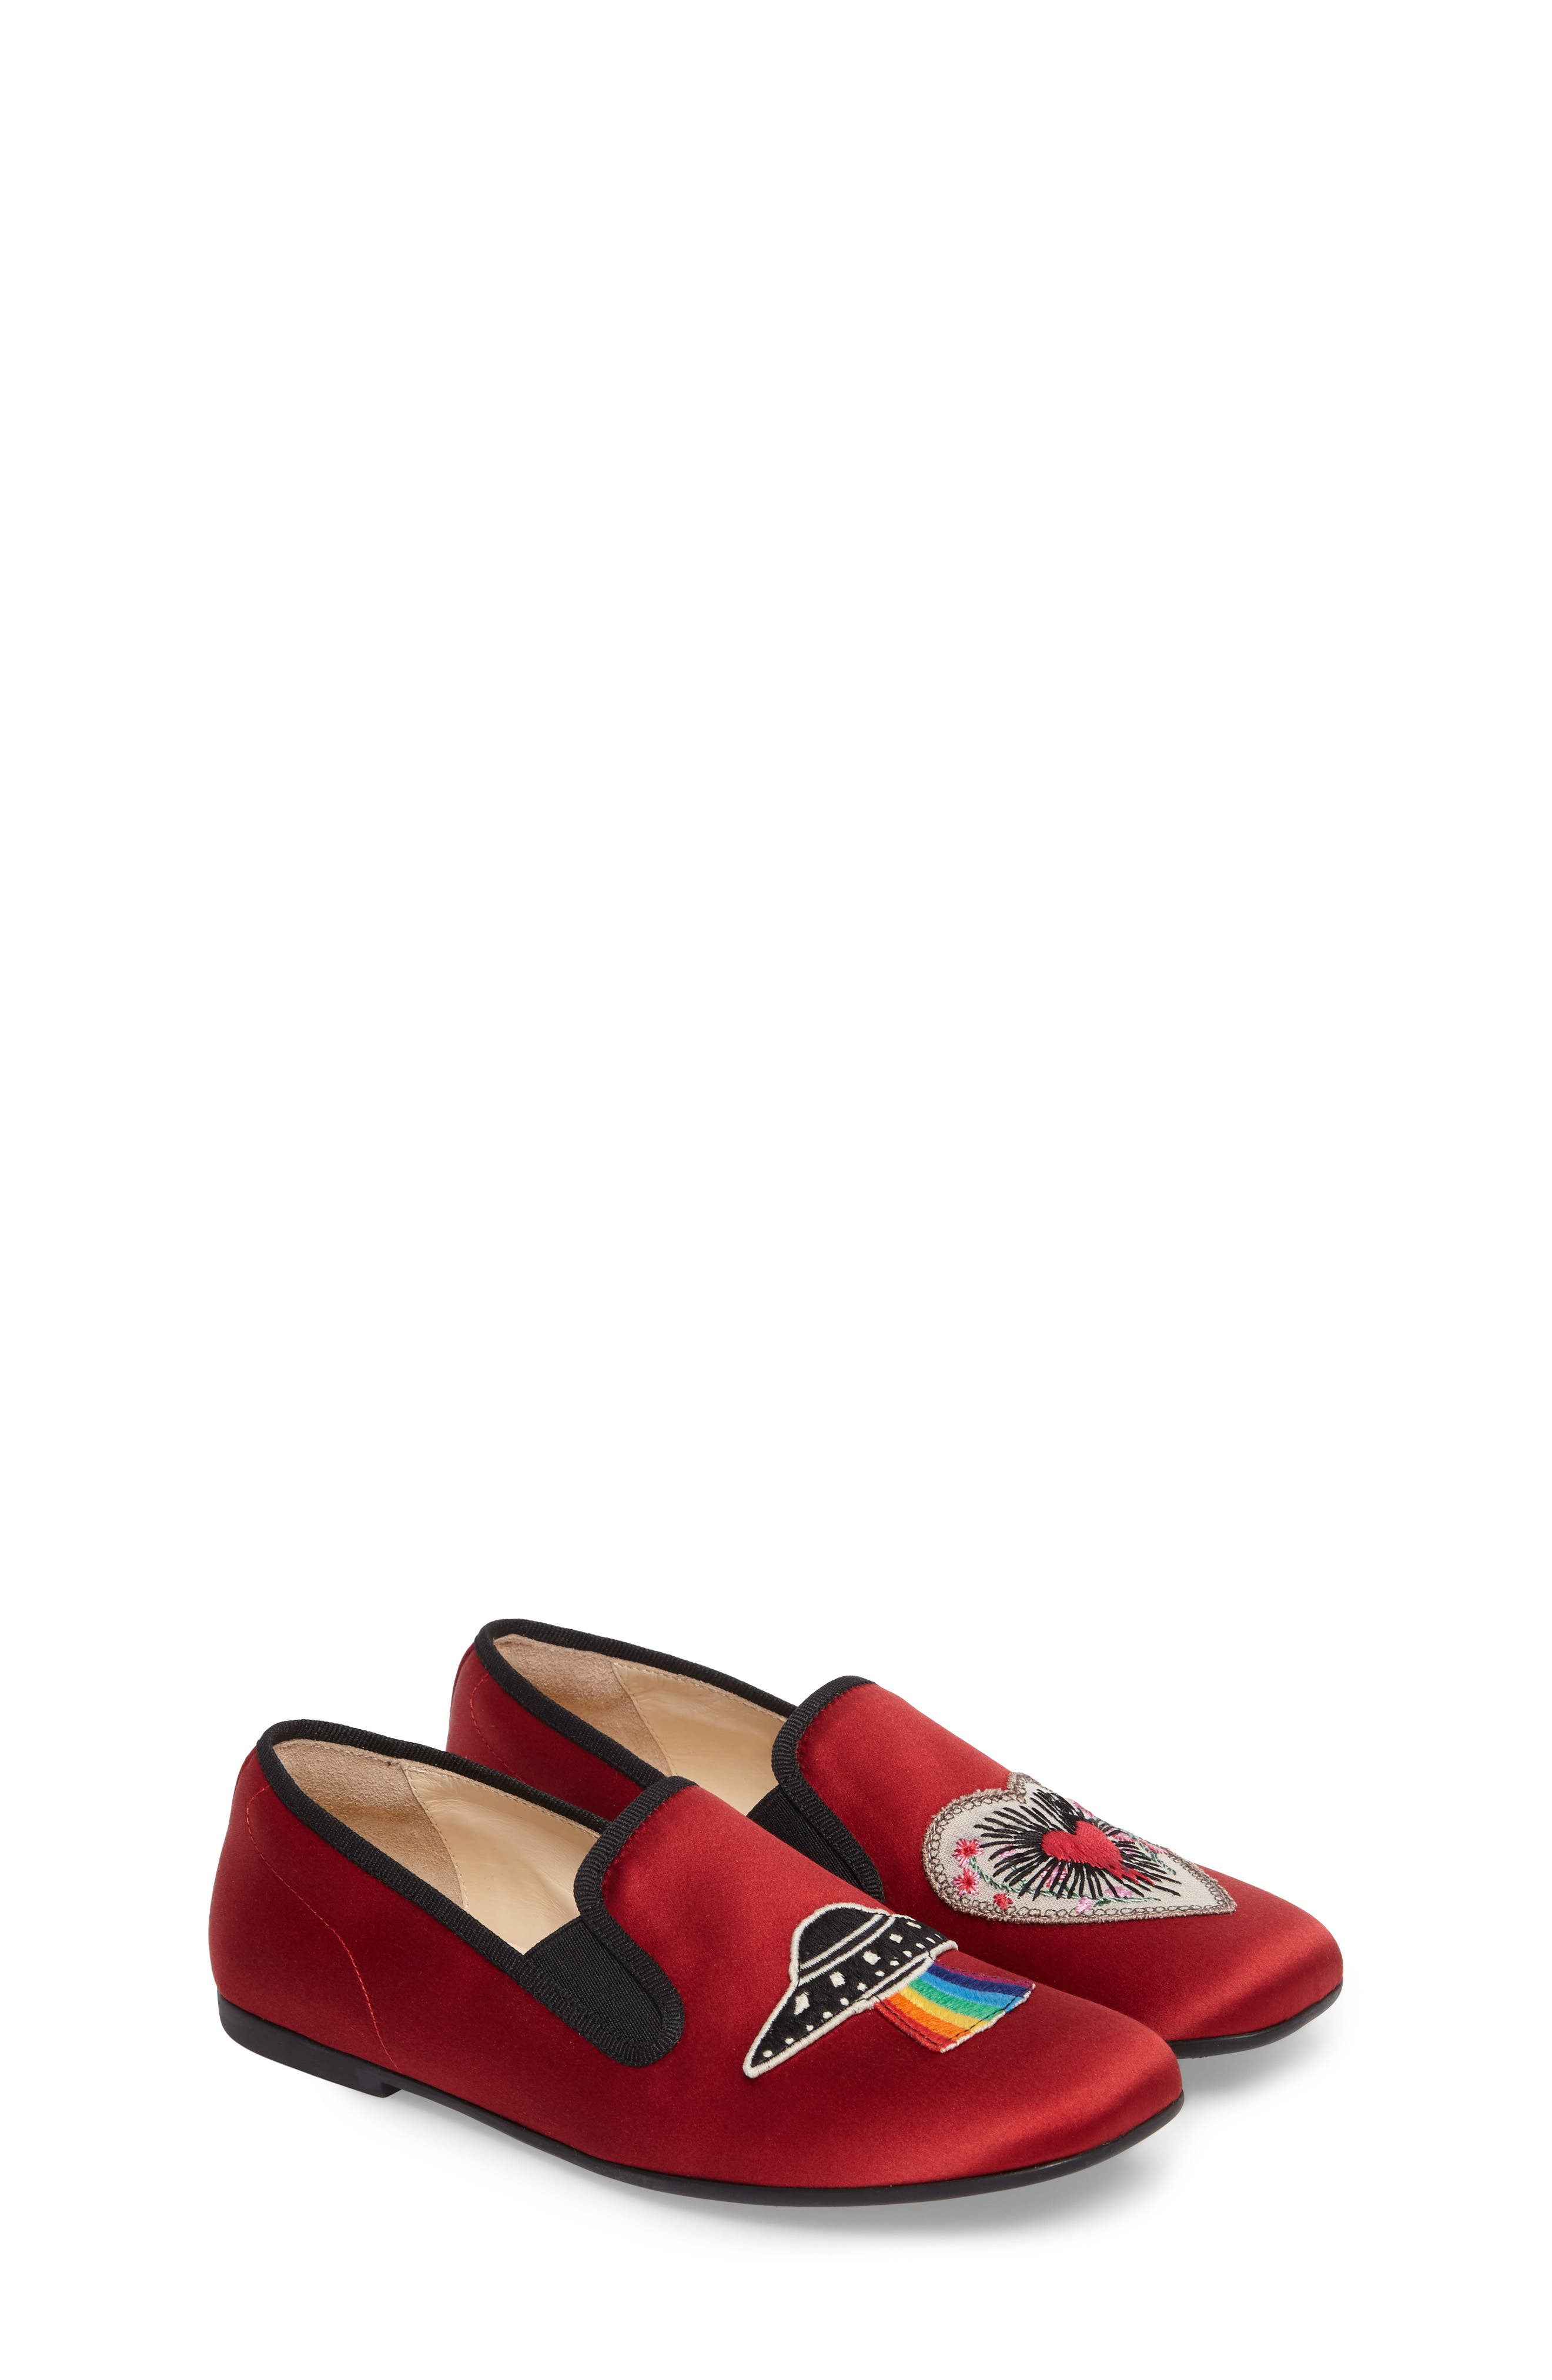 Gucci Nannie Appliqué Loafer Flat (Toddler, Little Kid & Big Kid)